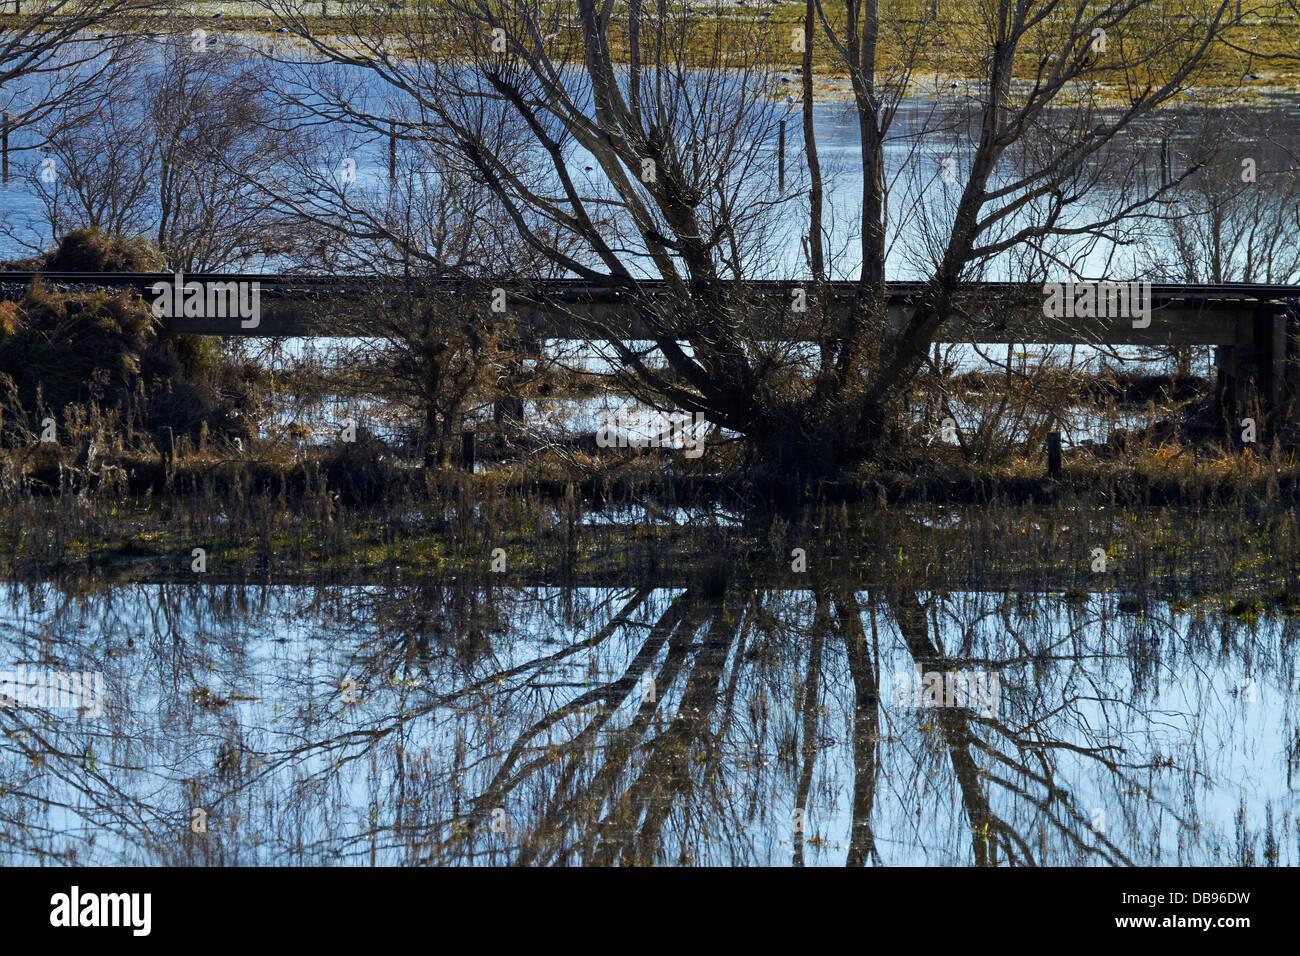 Railway line, willows and flooding, Taieri Plains, near Dunedin, South Island, New Zealand - Stock Image